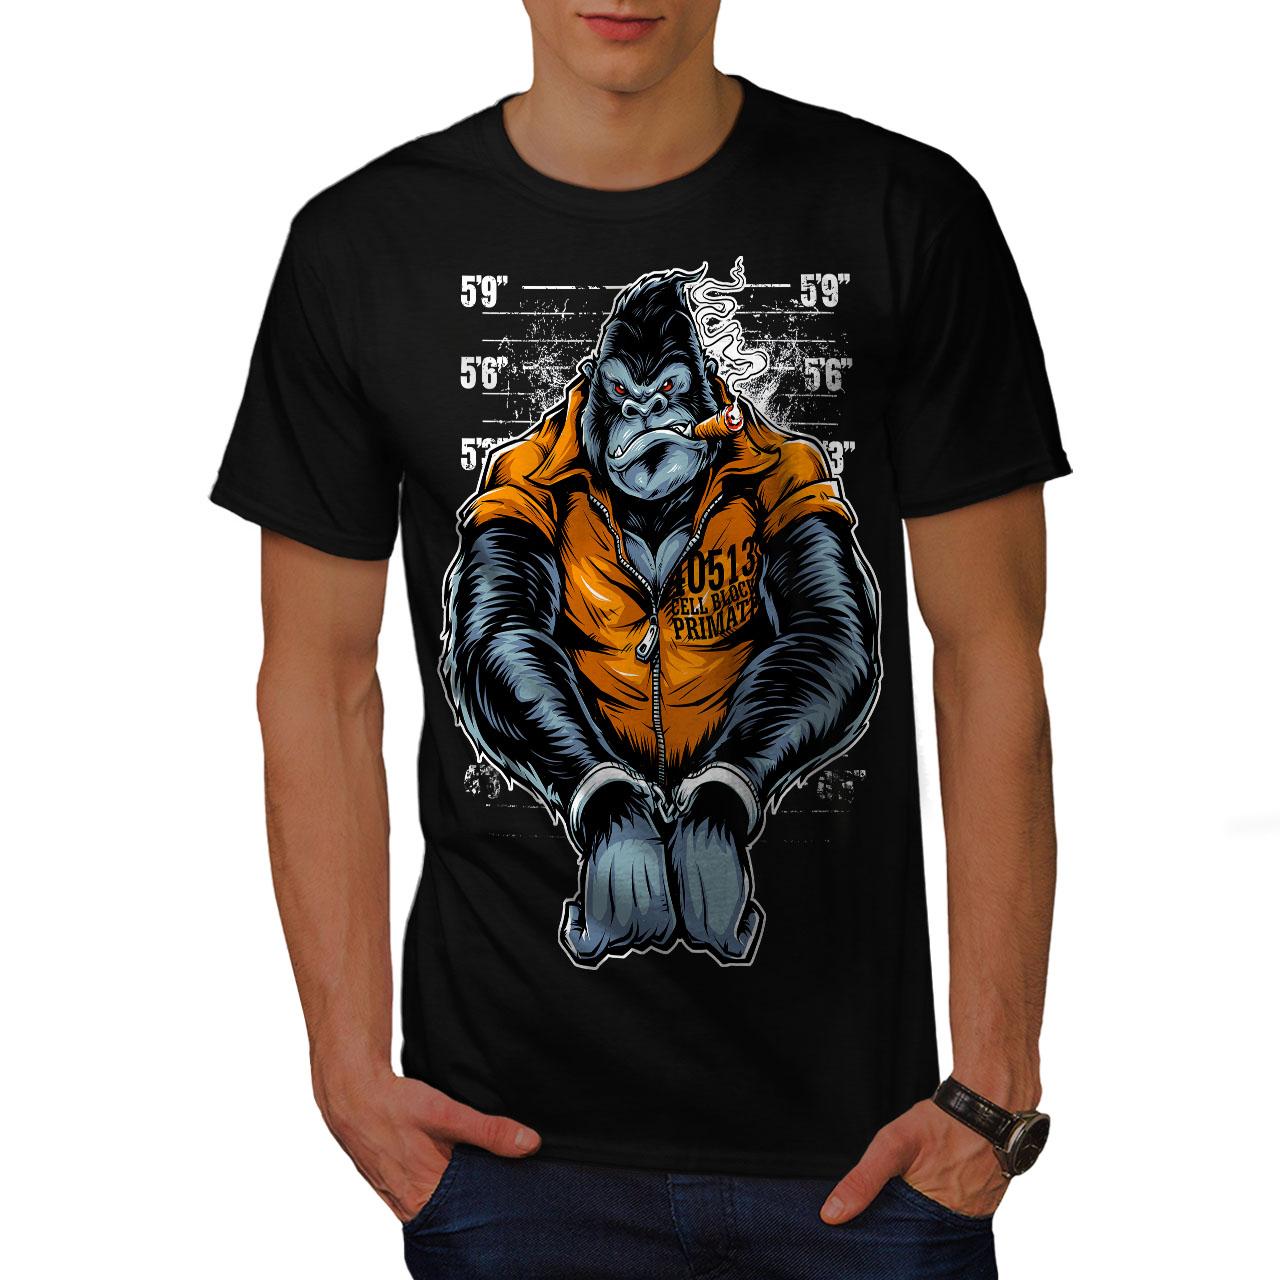 Wellcoda-Monkey-Ape-Prison-Mens-T-shirt-Wild-Graphic-Design-Printed-Tee thumbnail 3